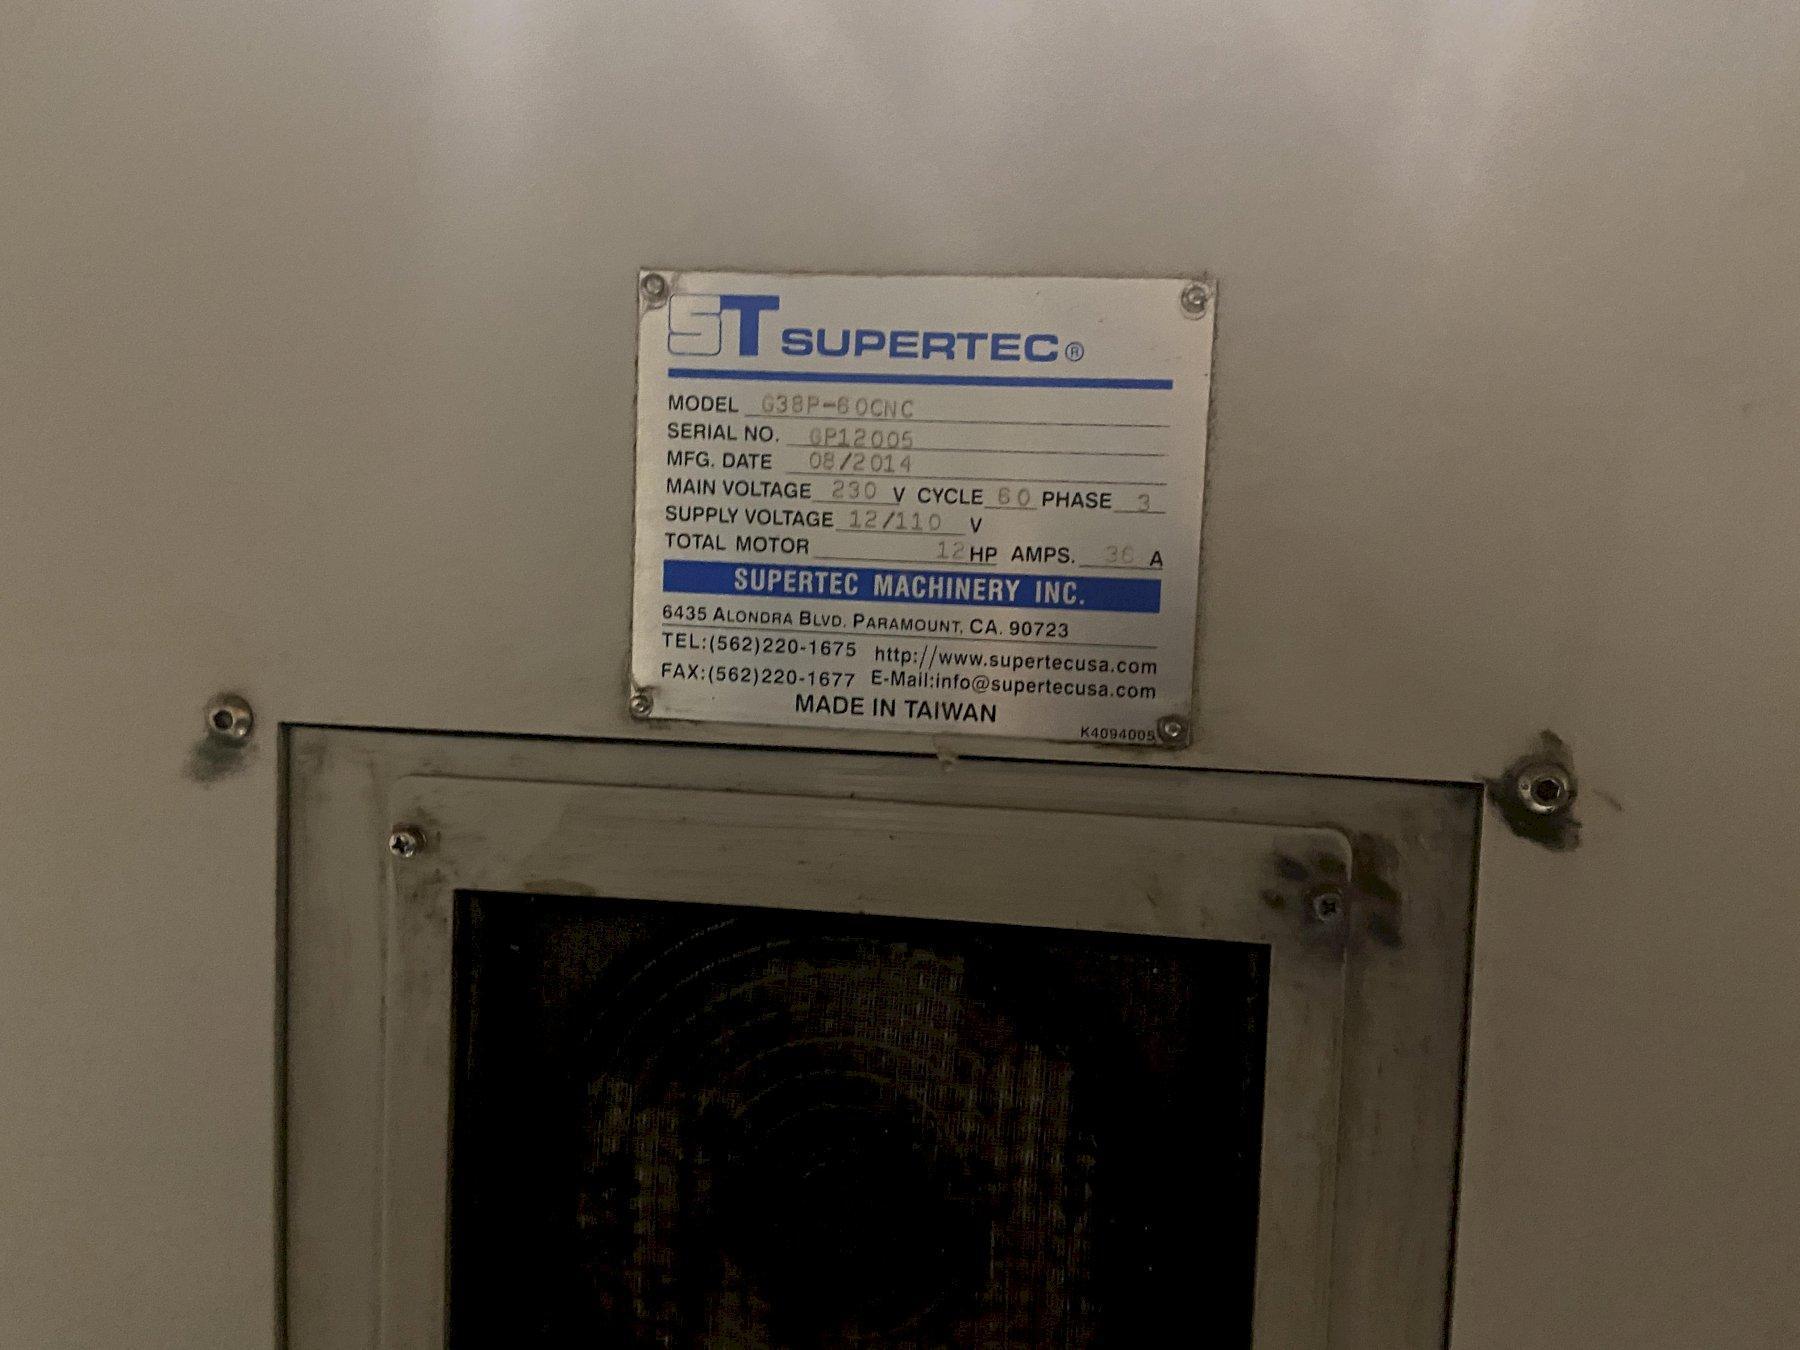 "Supertec G38P-60CNC Cylindrical Grinder, Fanuc 0iMC, 15"" Swing, 24"" Centers, 18"" Wheel Dia., Chi"